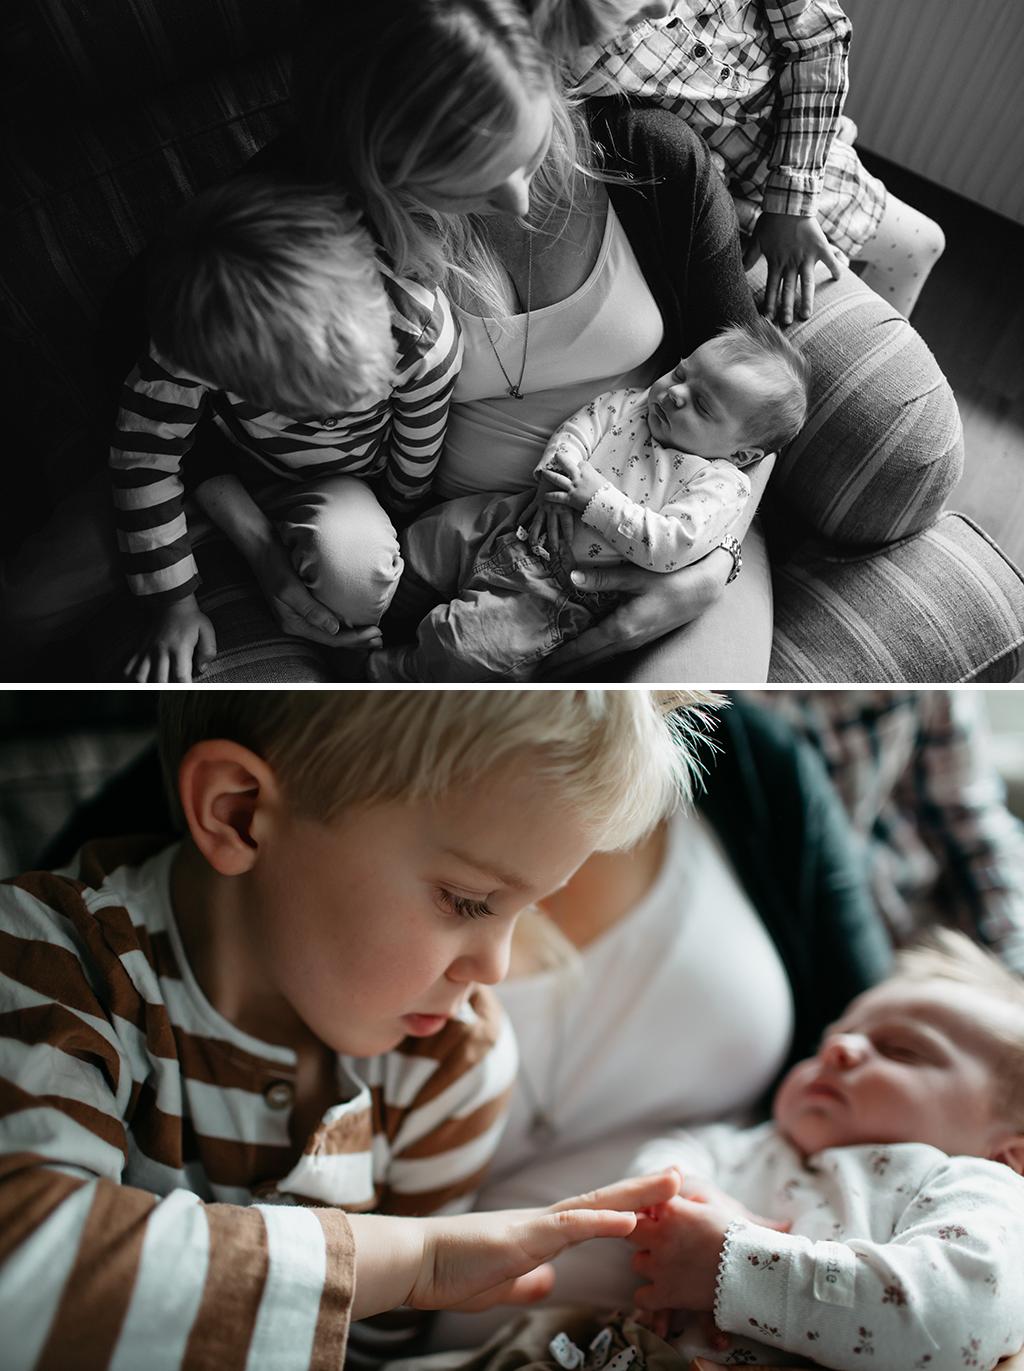 Nyfoddfotografering-lifestyle-familjefotograf-Stockholm_3.jpg